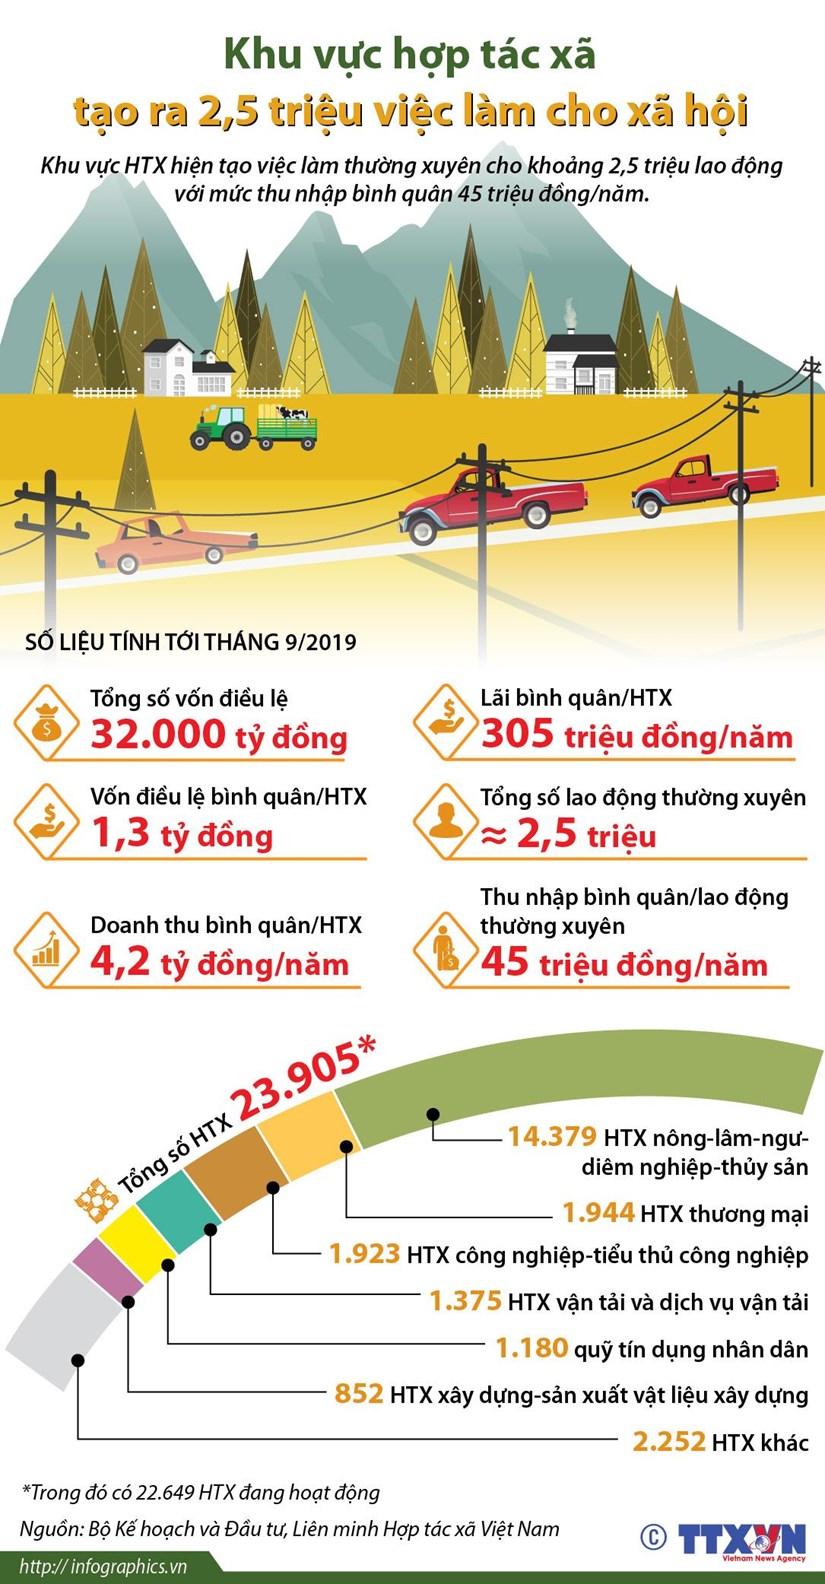 [Infographics] Khu vuc hop tac xa tao ra 2,5 trieu viec lam hinh anh 1